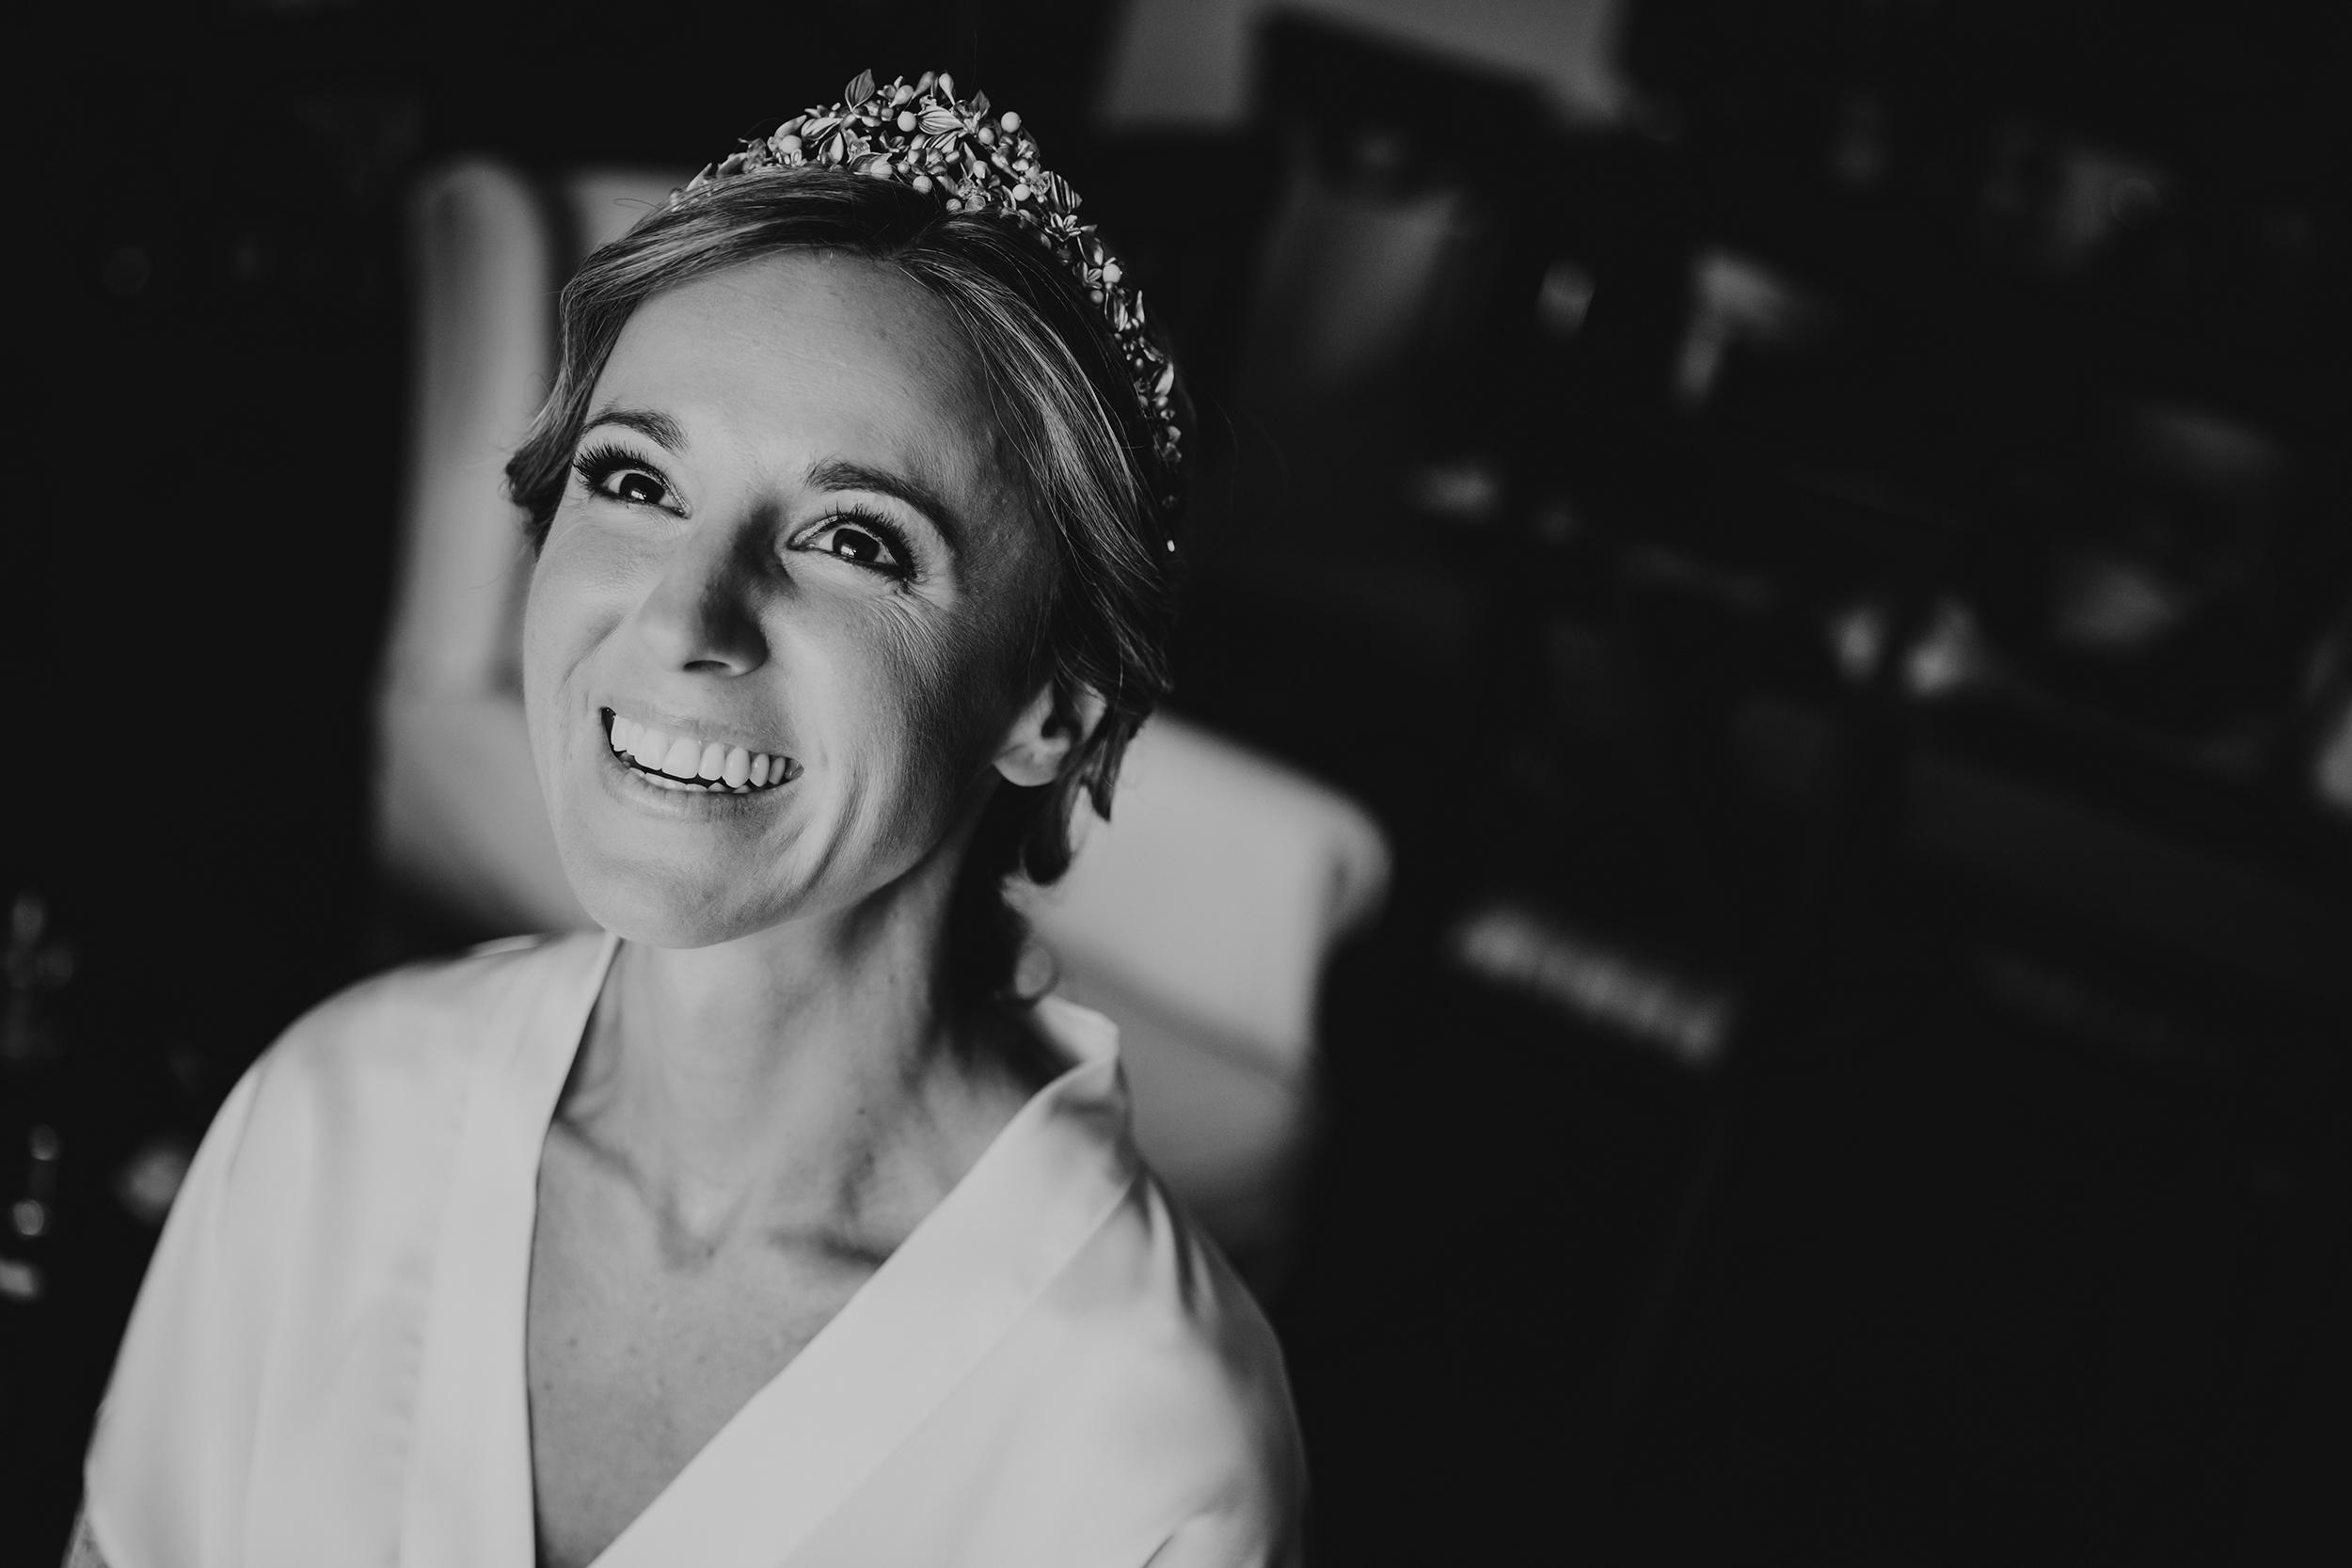 fotografo-bodas-granada-catedral-sagrario-jose-reyes_006.jpg